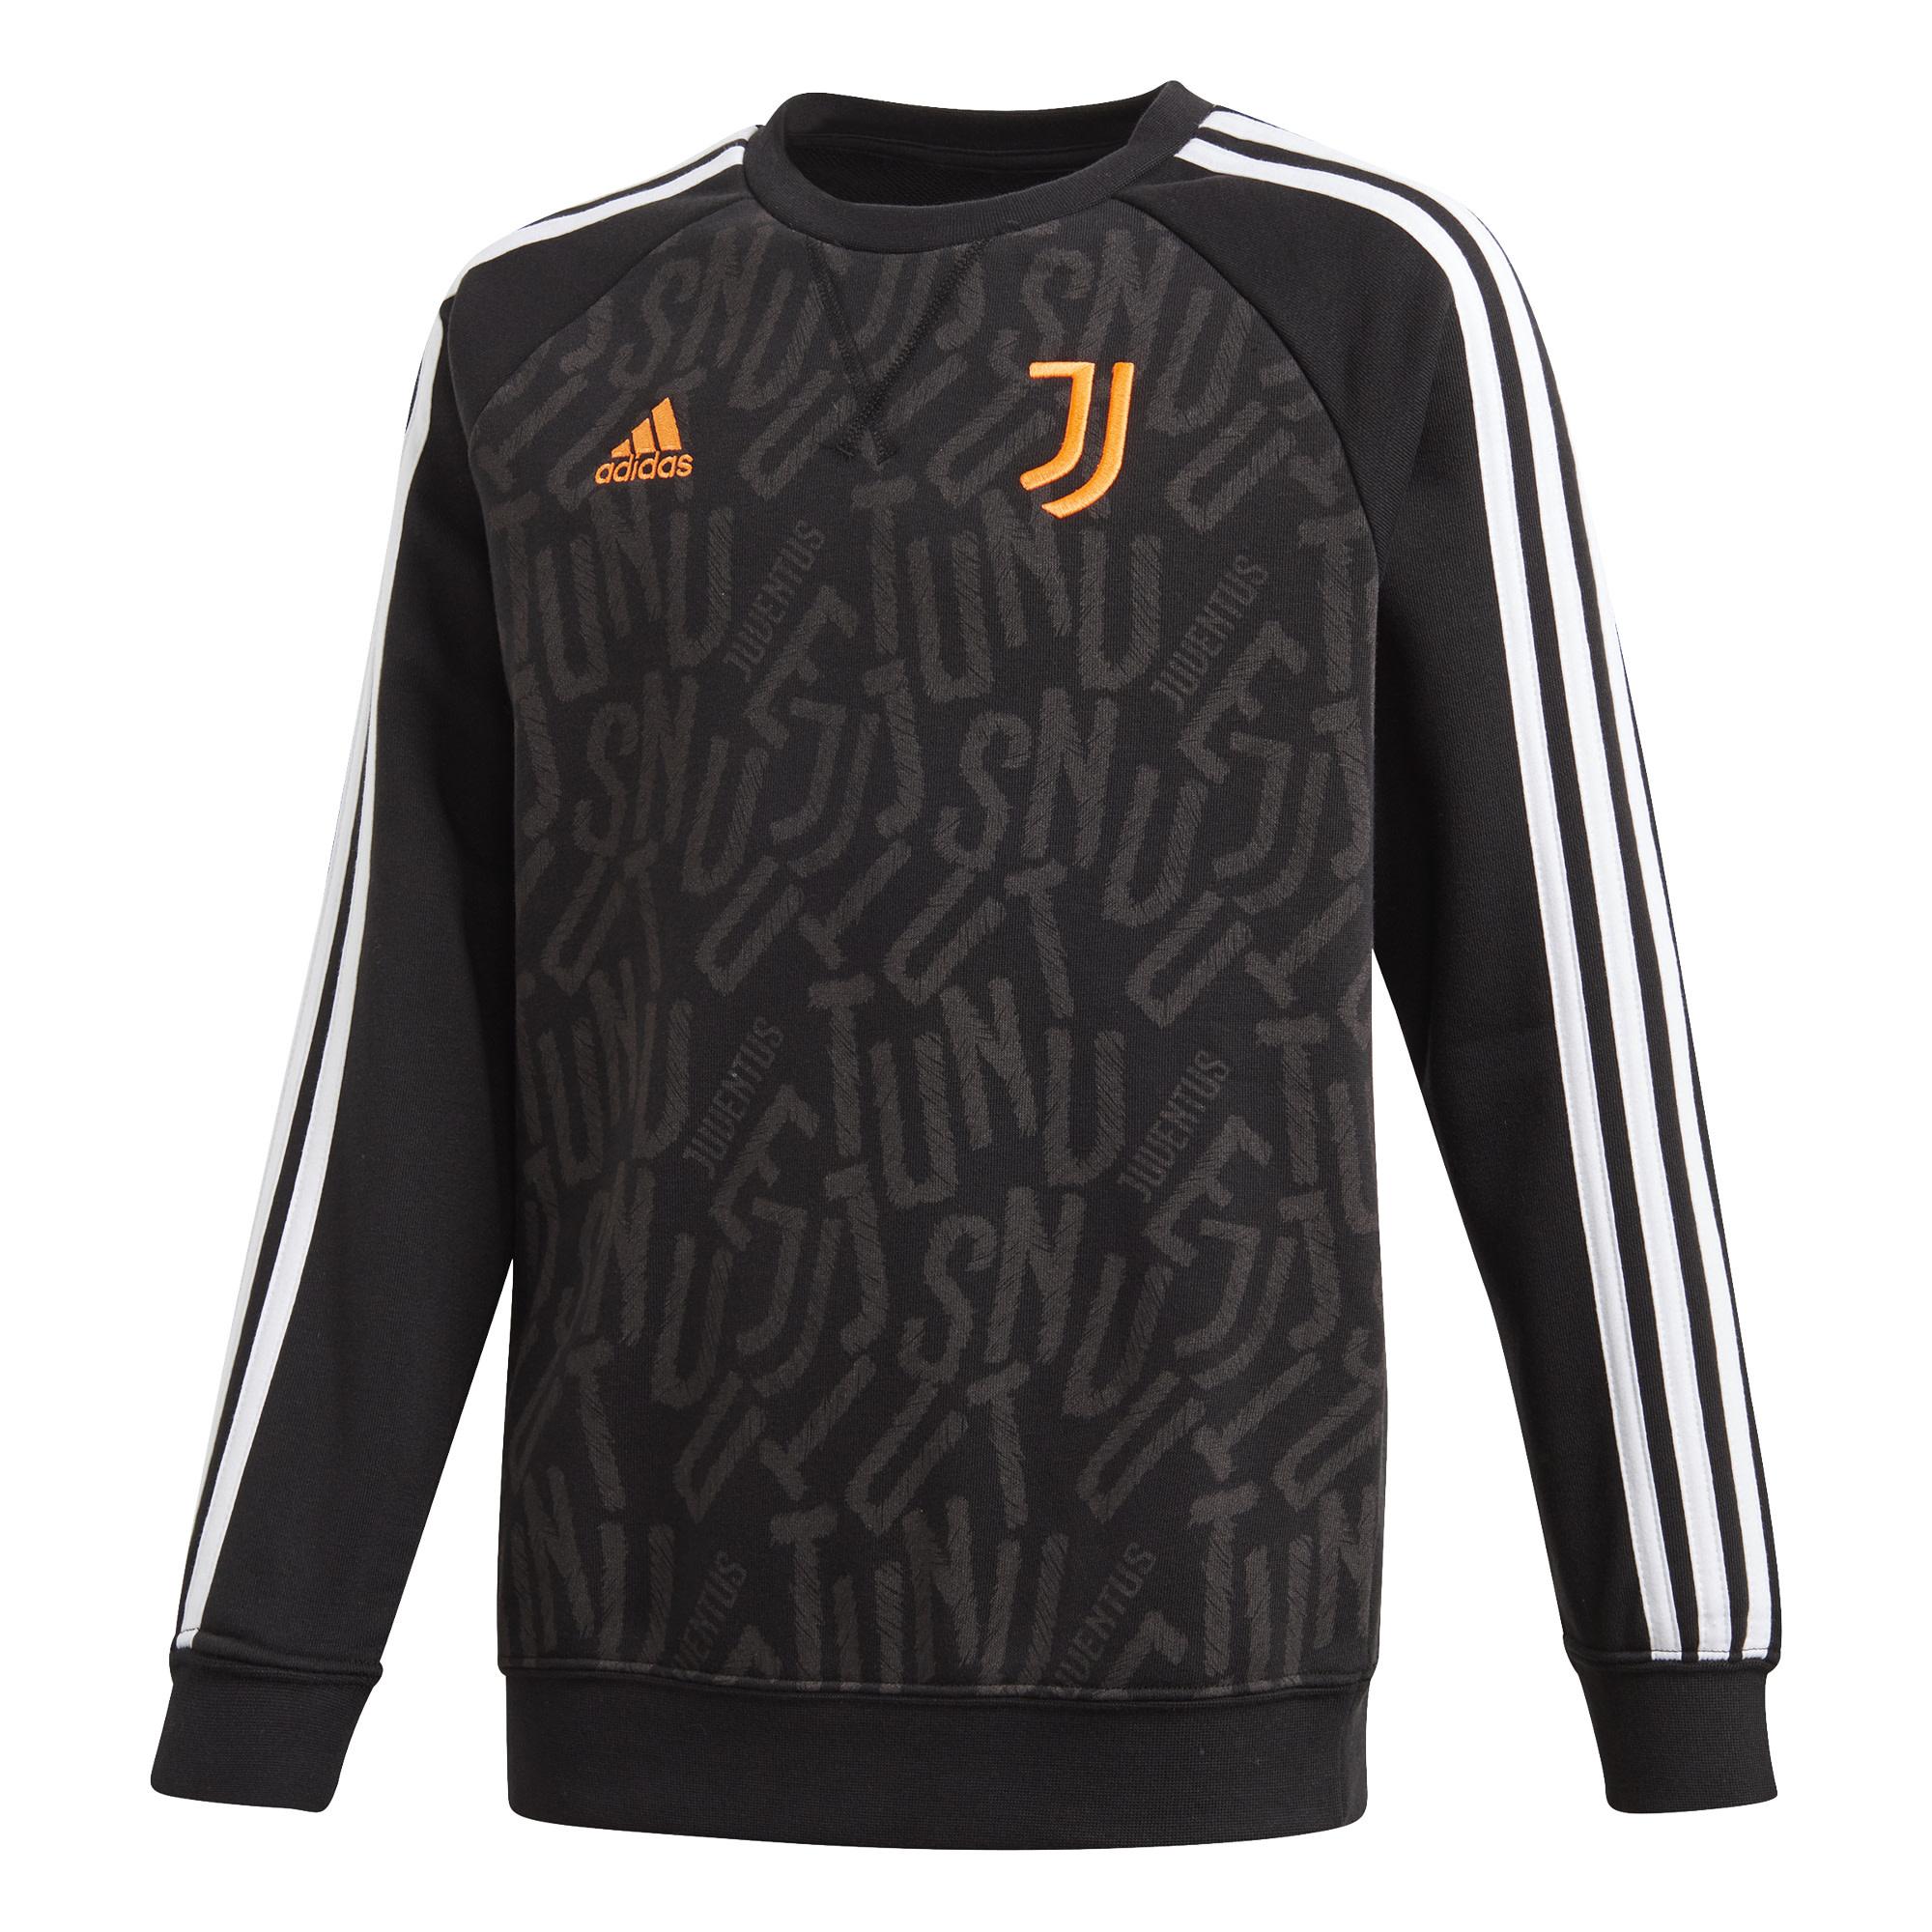 Adidas ADIDAS JR Juventus Crew